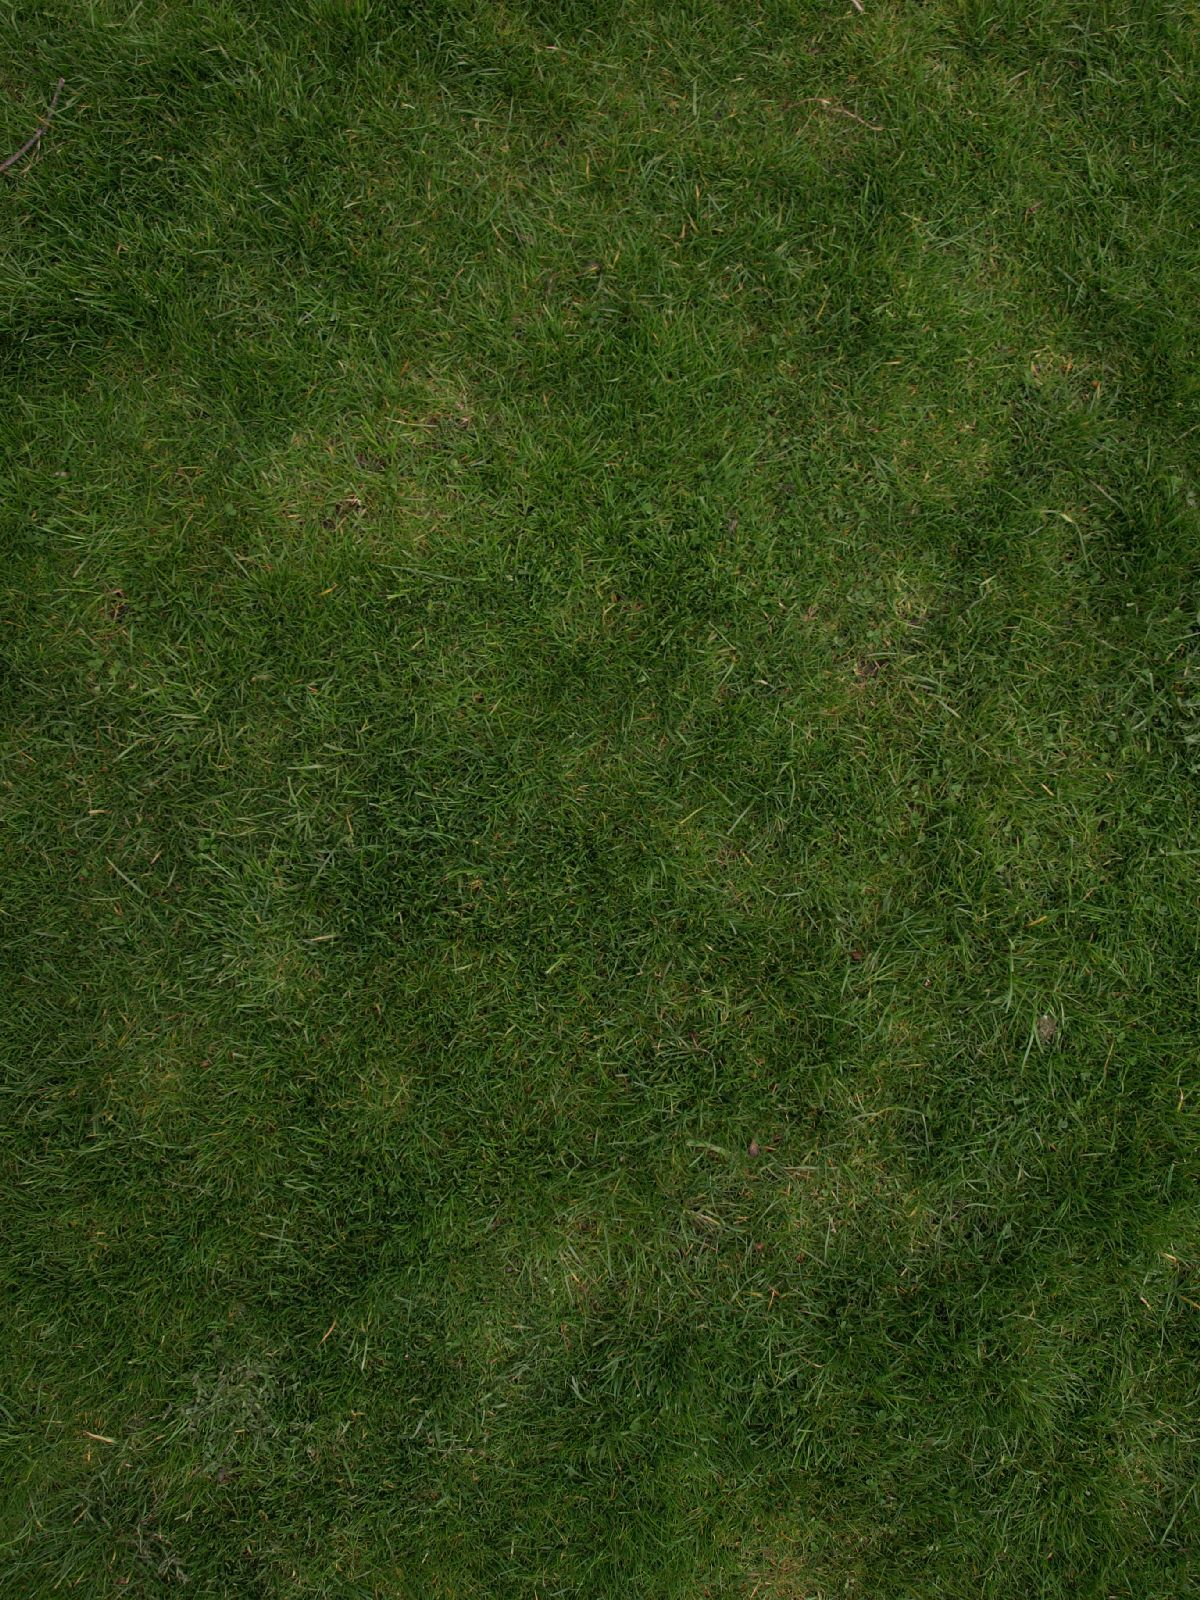 Grass Blades Free Vector Art - (24,916 Free Downloads)